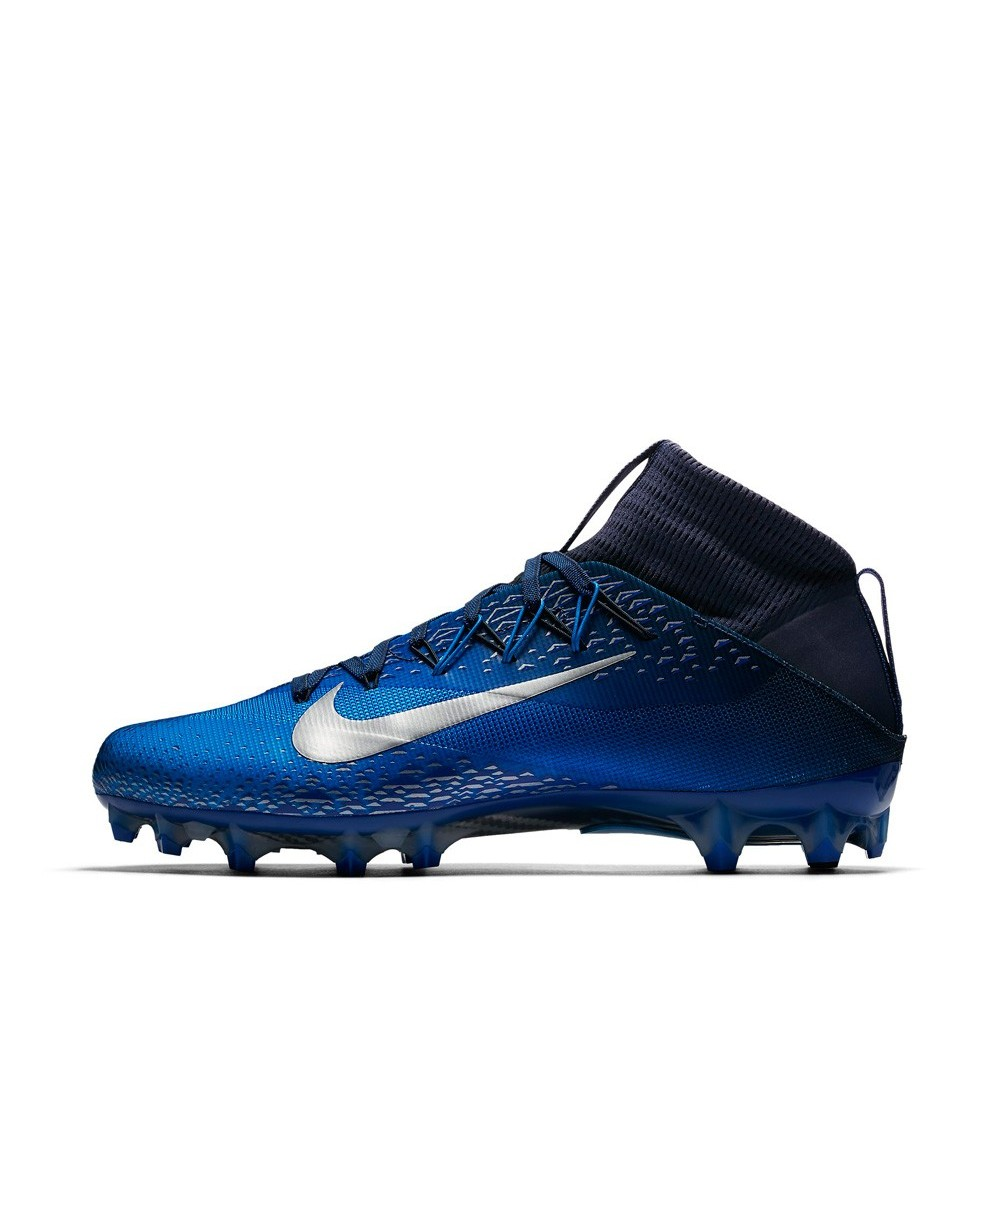 info for fae2d 007a8 Nike Vapor Untouchable 2 Crampons de Football Américain Homme Navy